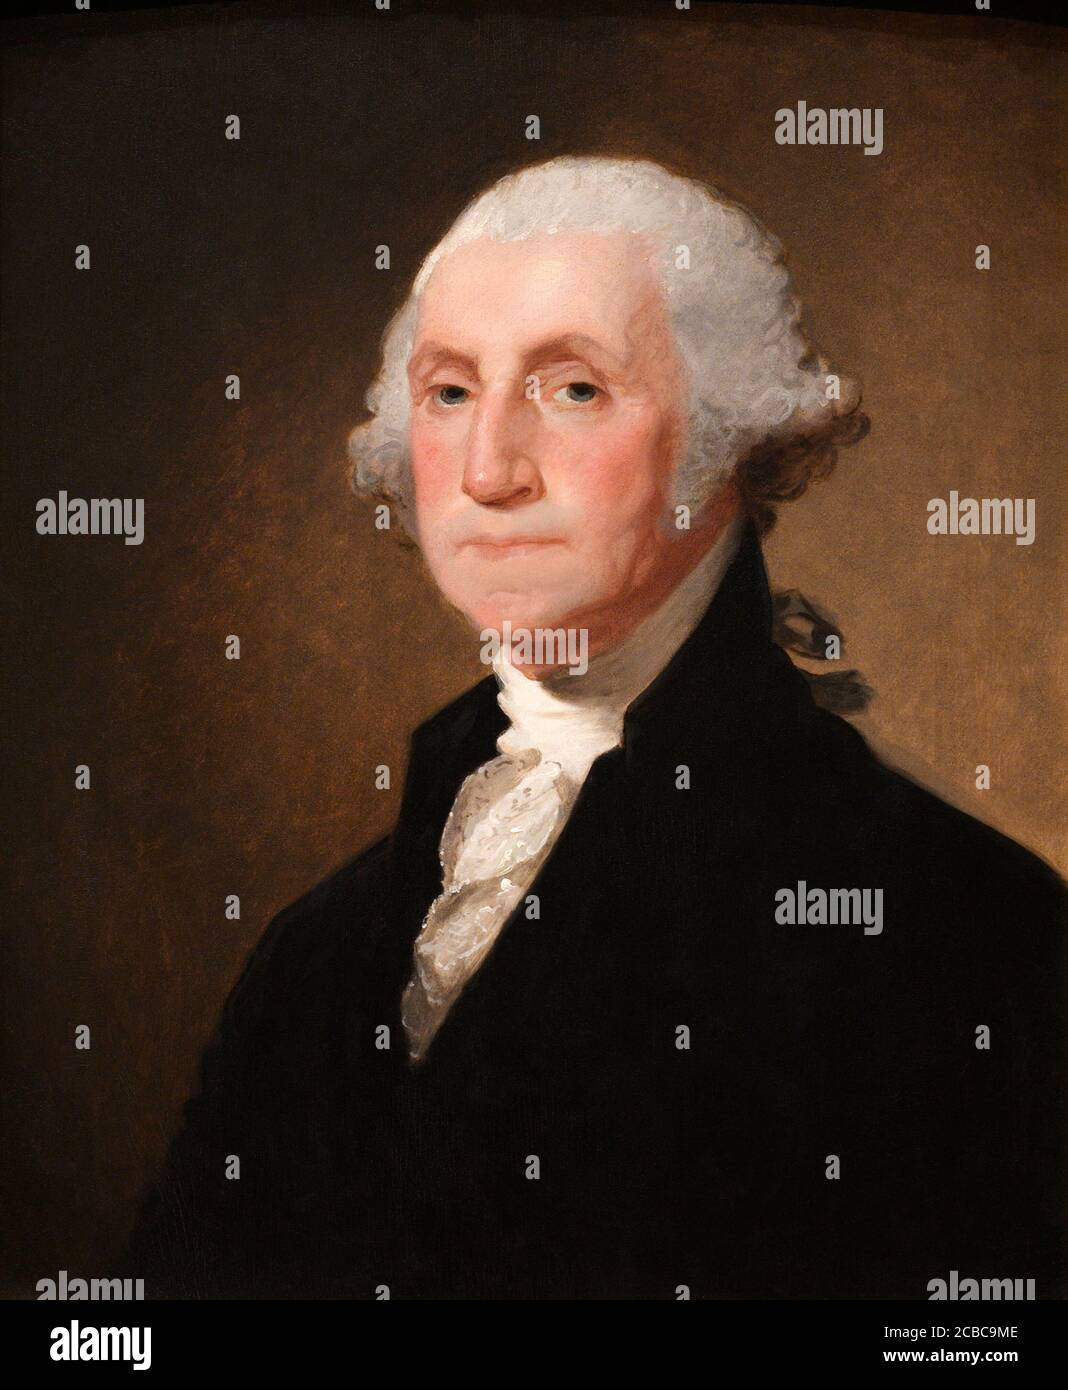 George Washington by Gilbert Stuart, oil on wood,1821 Stock Photo